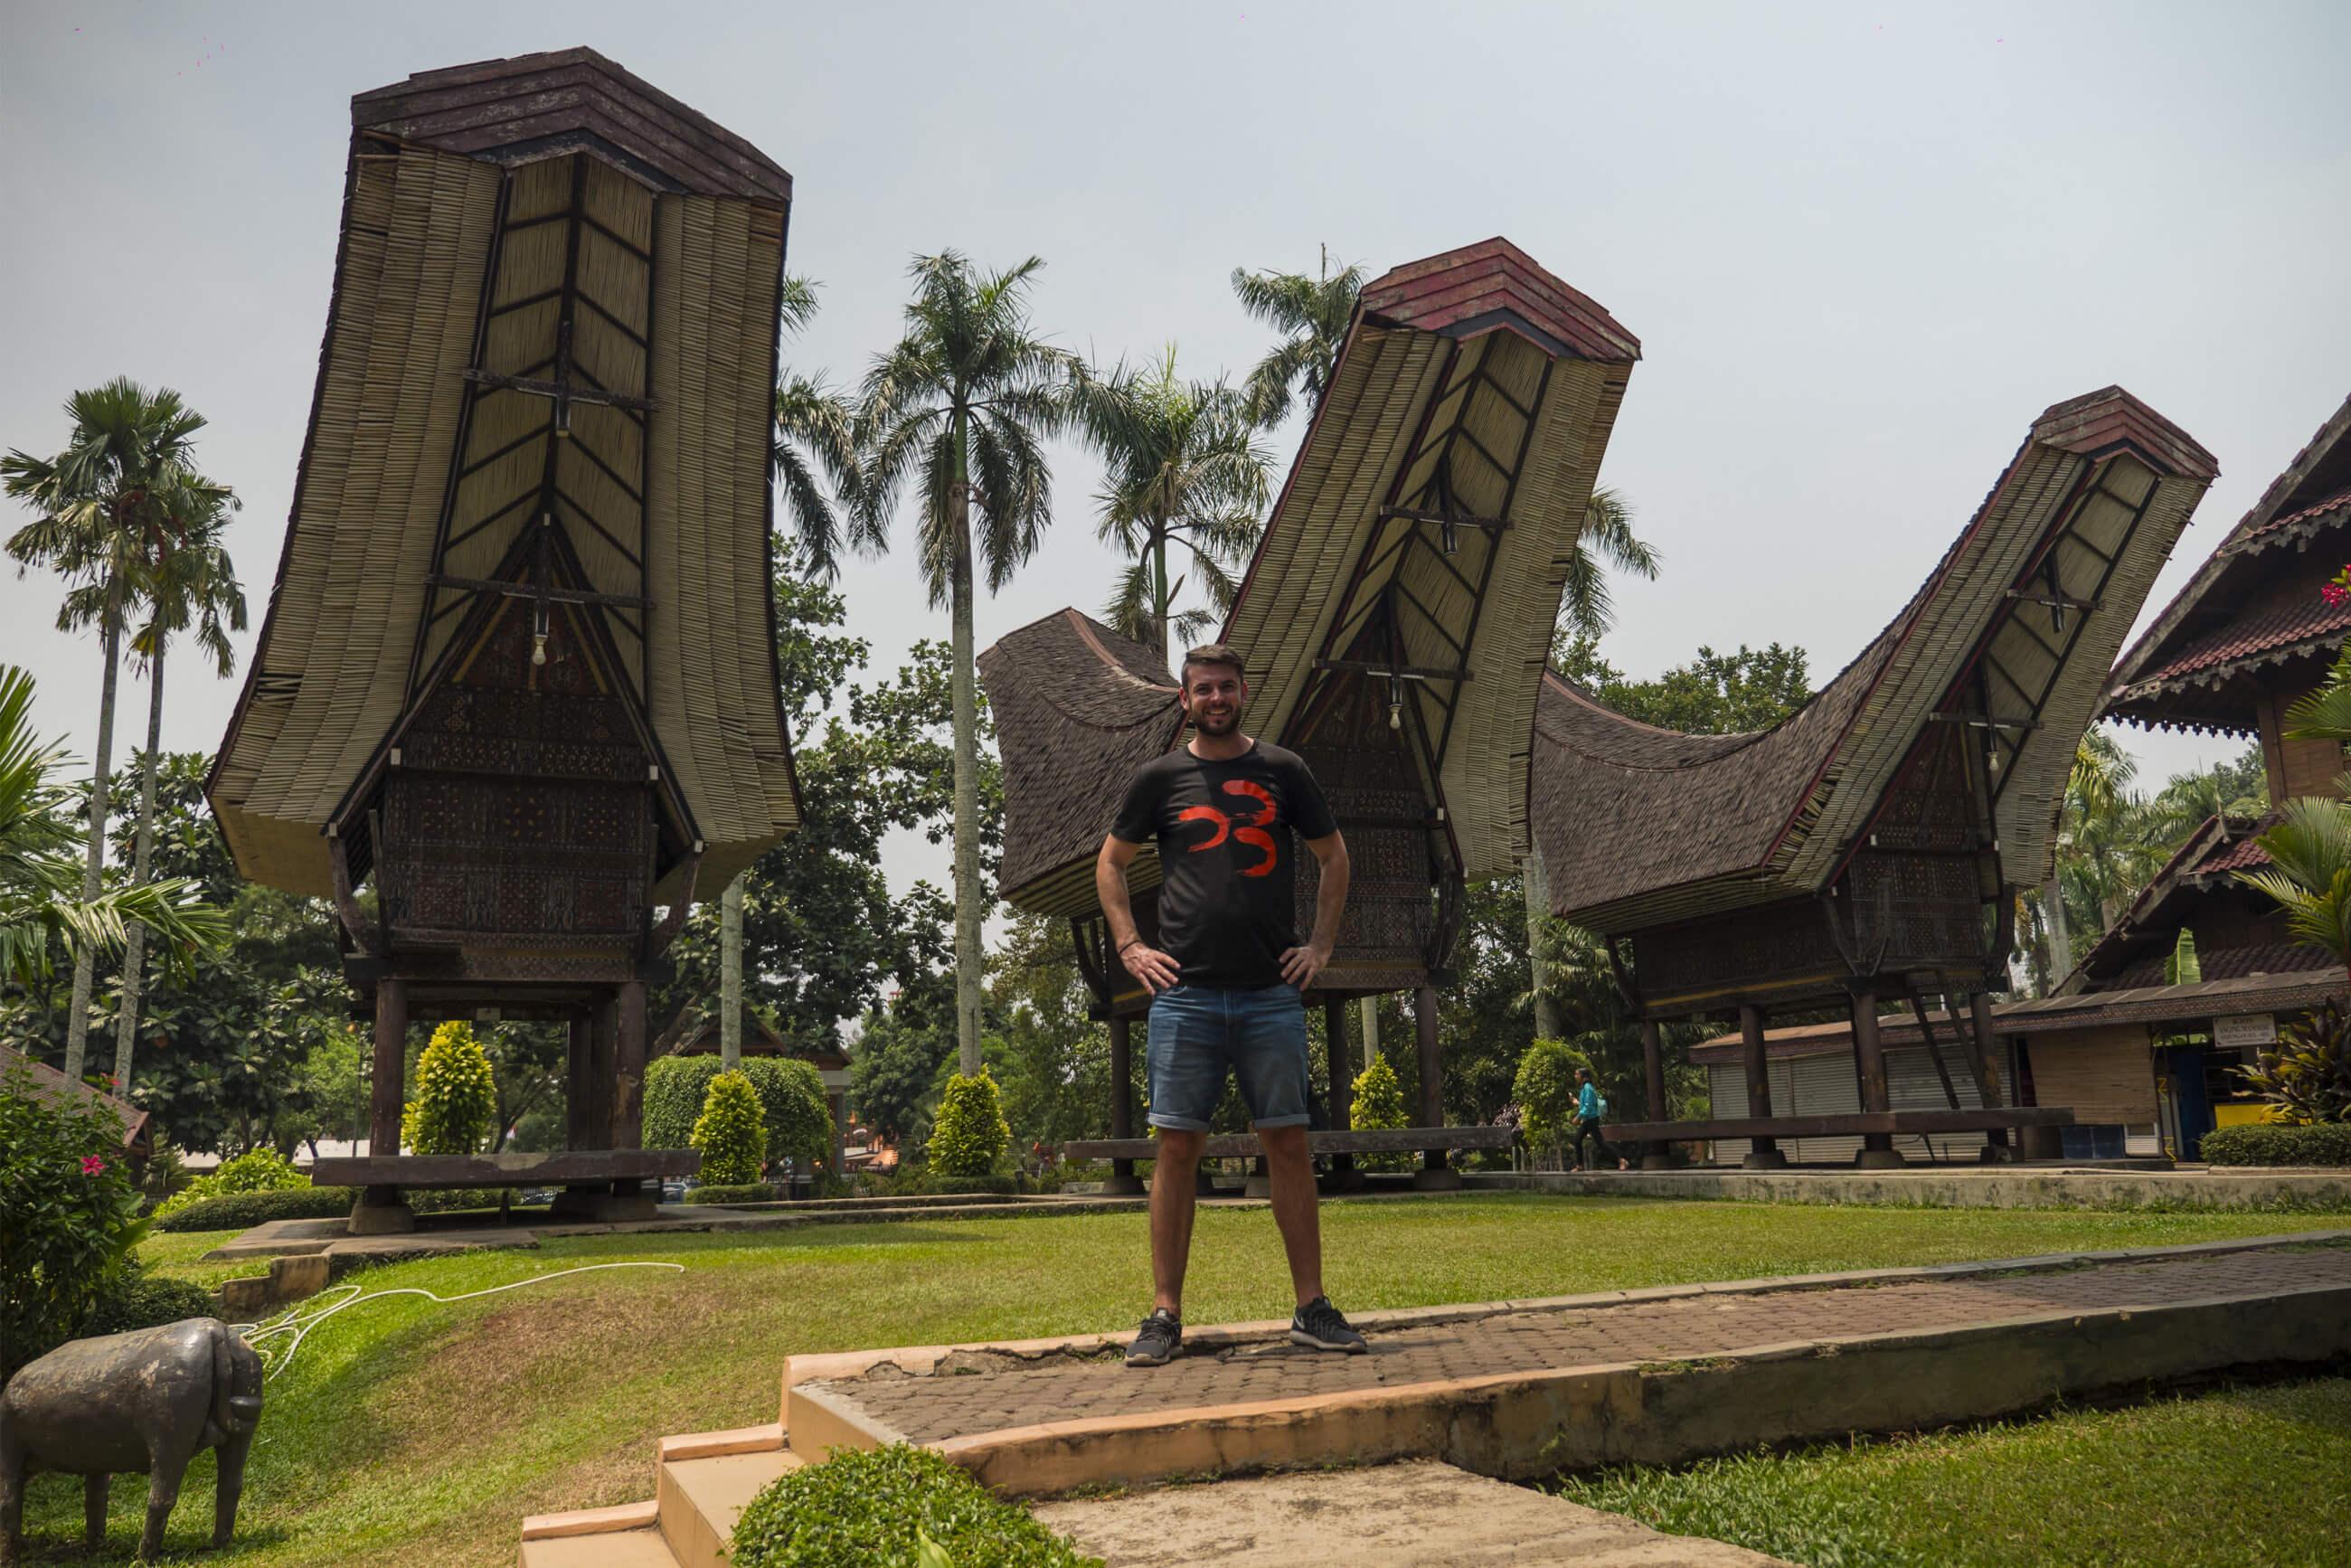 https://bubo.sk/uploads/galleries/7304/martin_simko_indonezia_java-2-.jpg